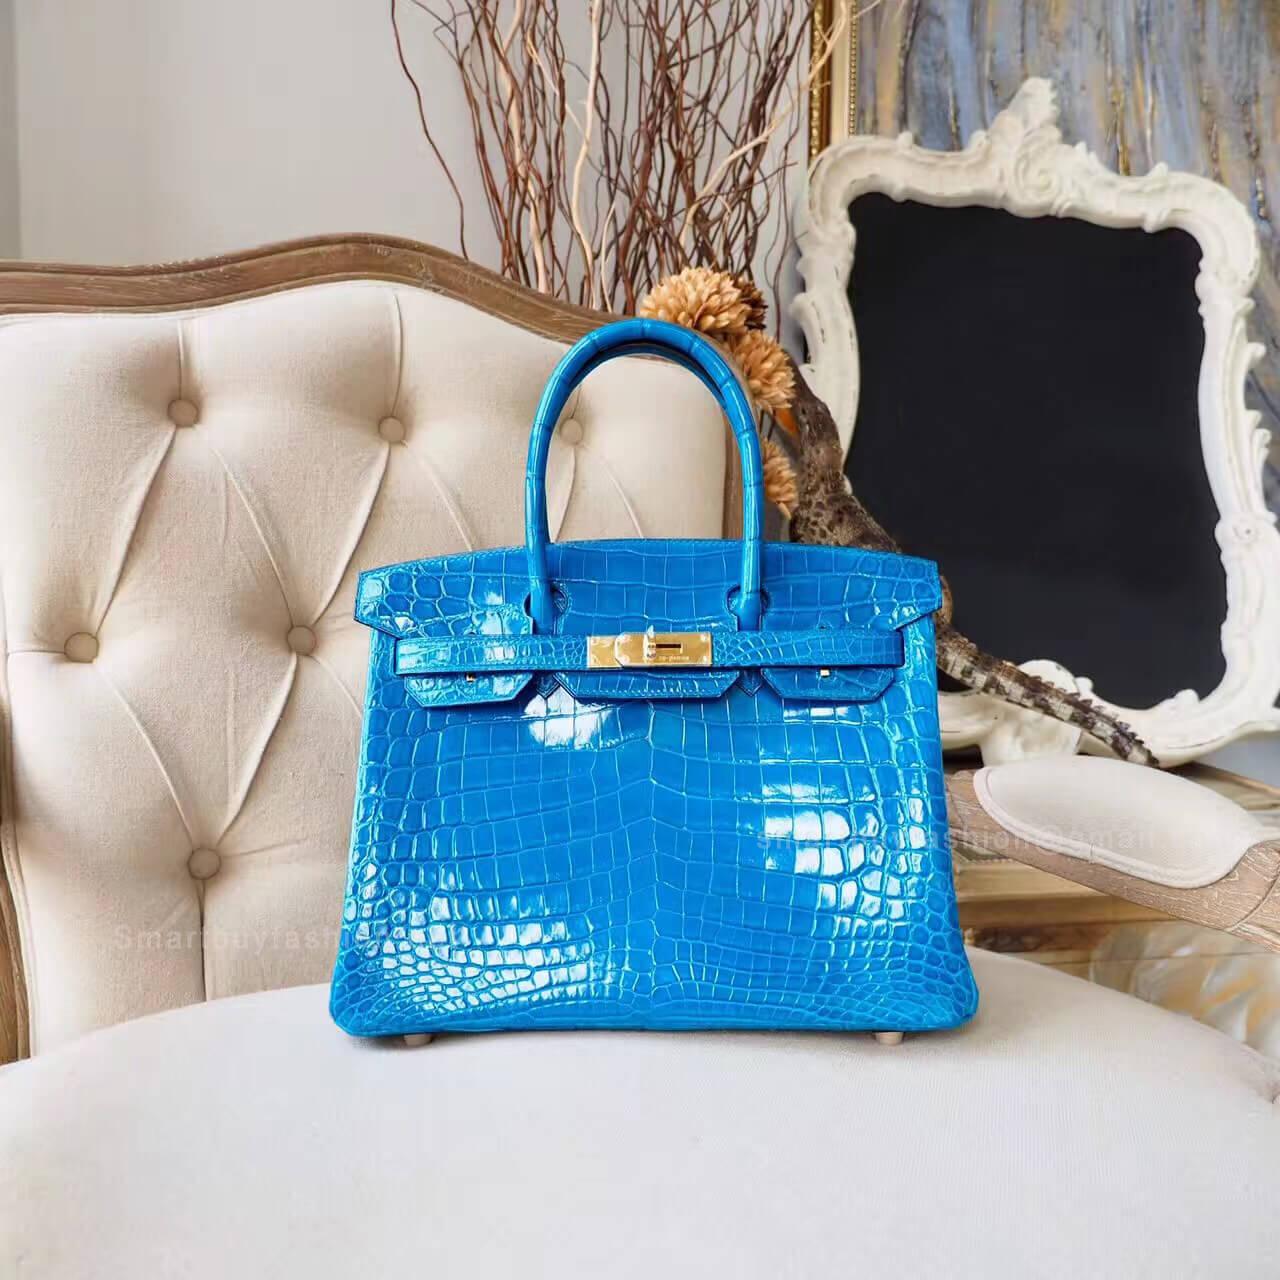 fb248fd3ca Hermes Birkin 30 Bag in 7w Blue Izmir Shiny Nile Croc GHW